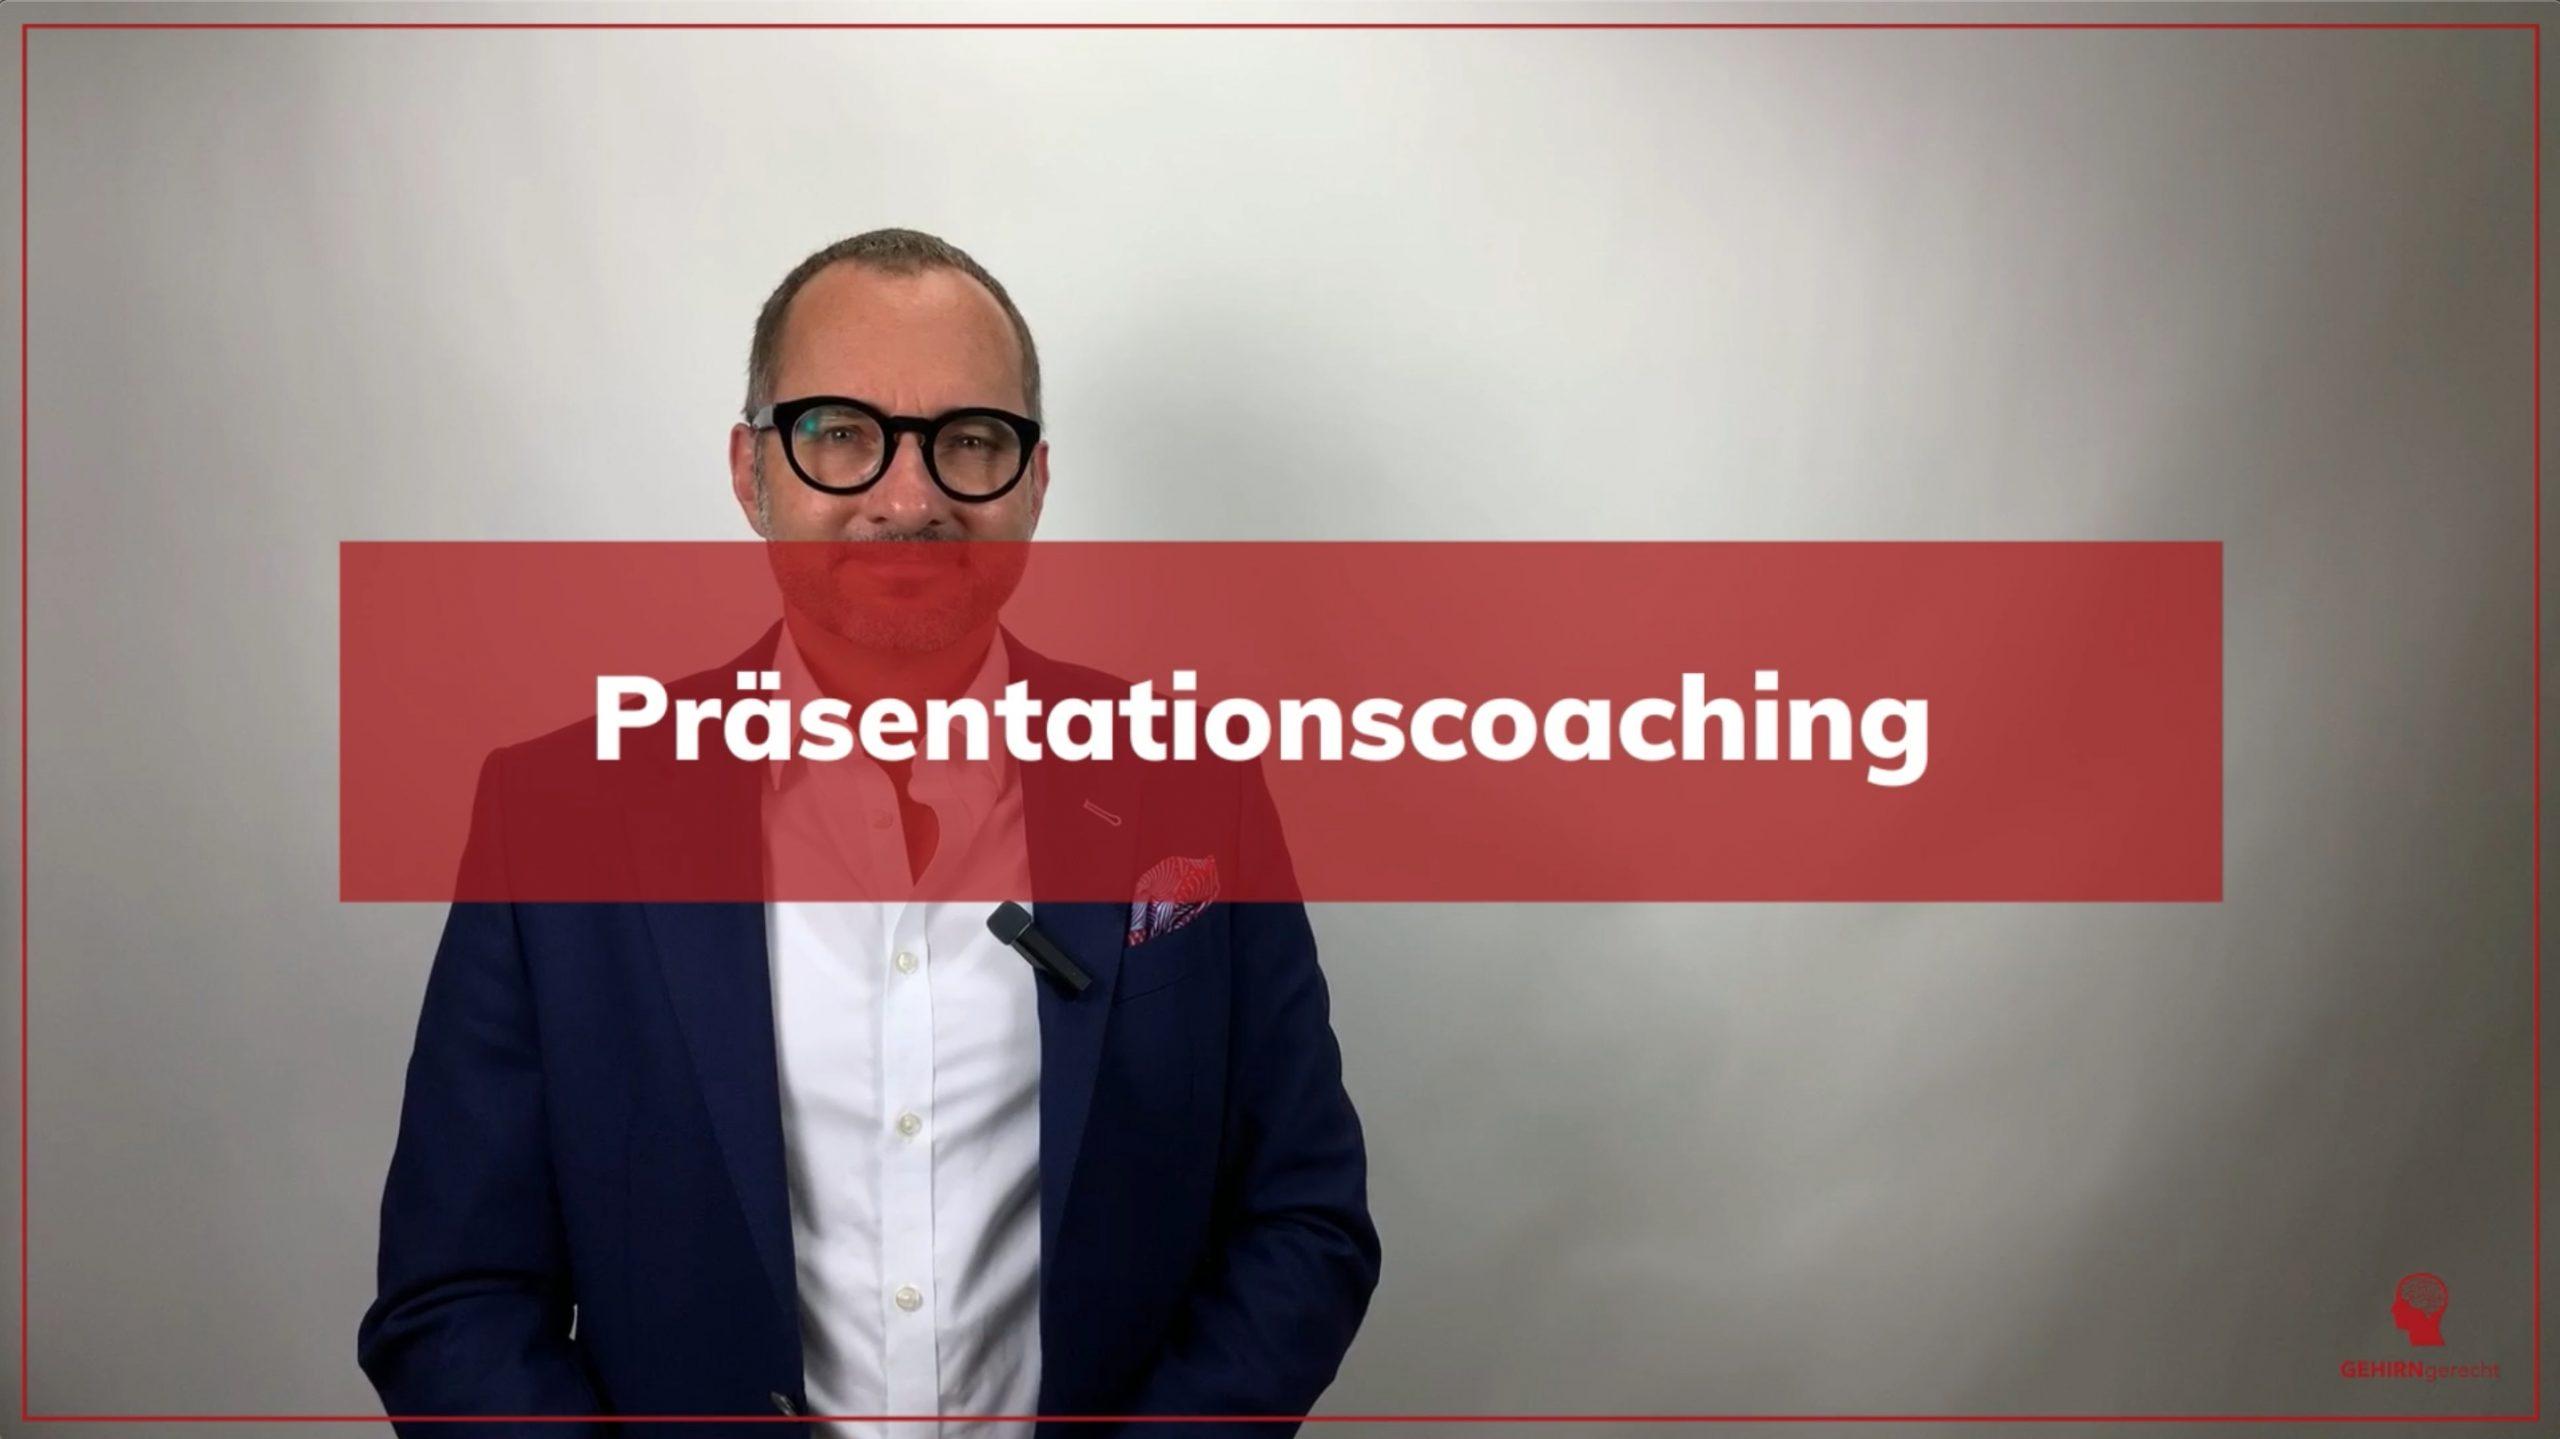 Präsentationscoaching